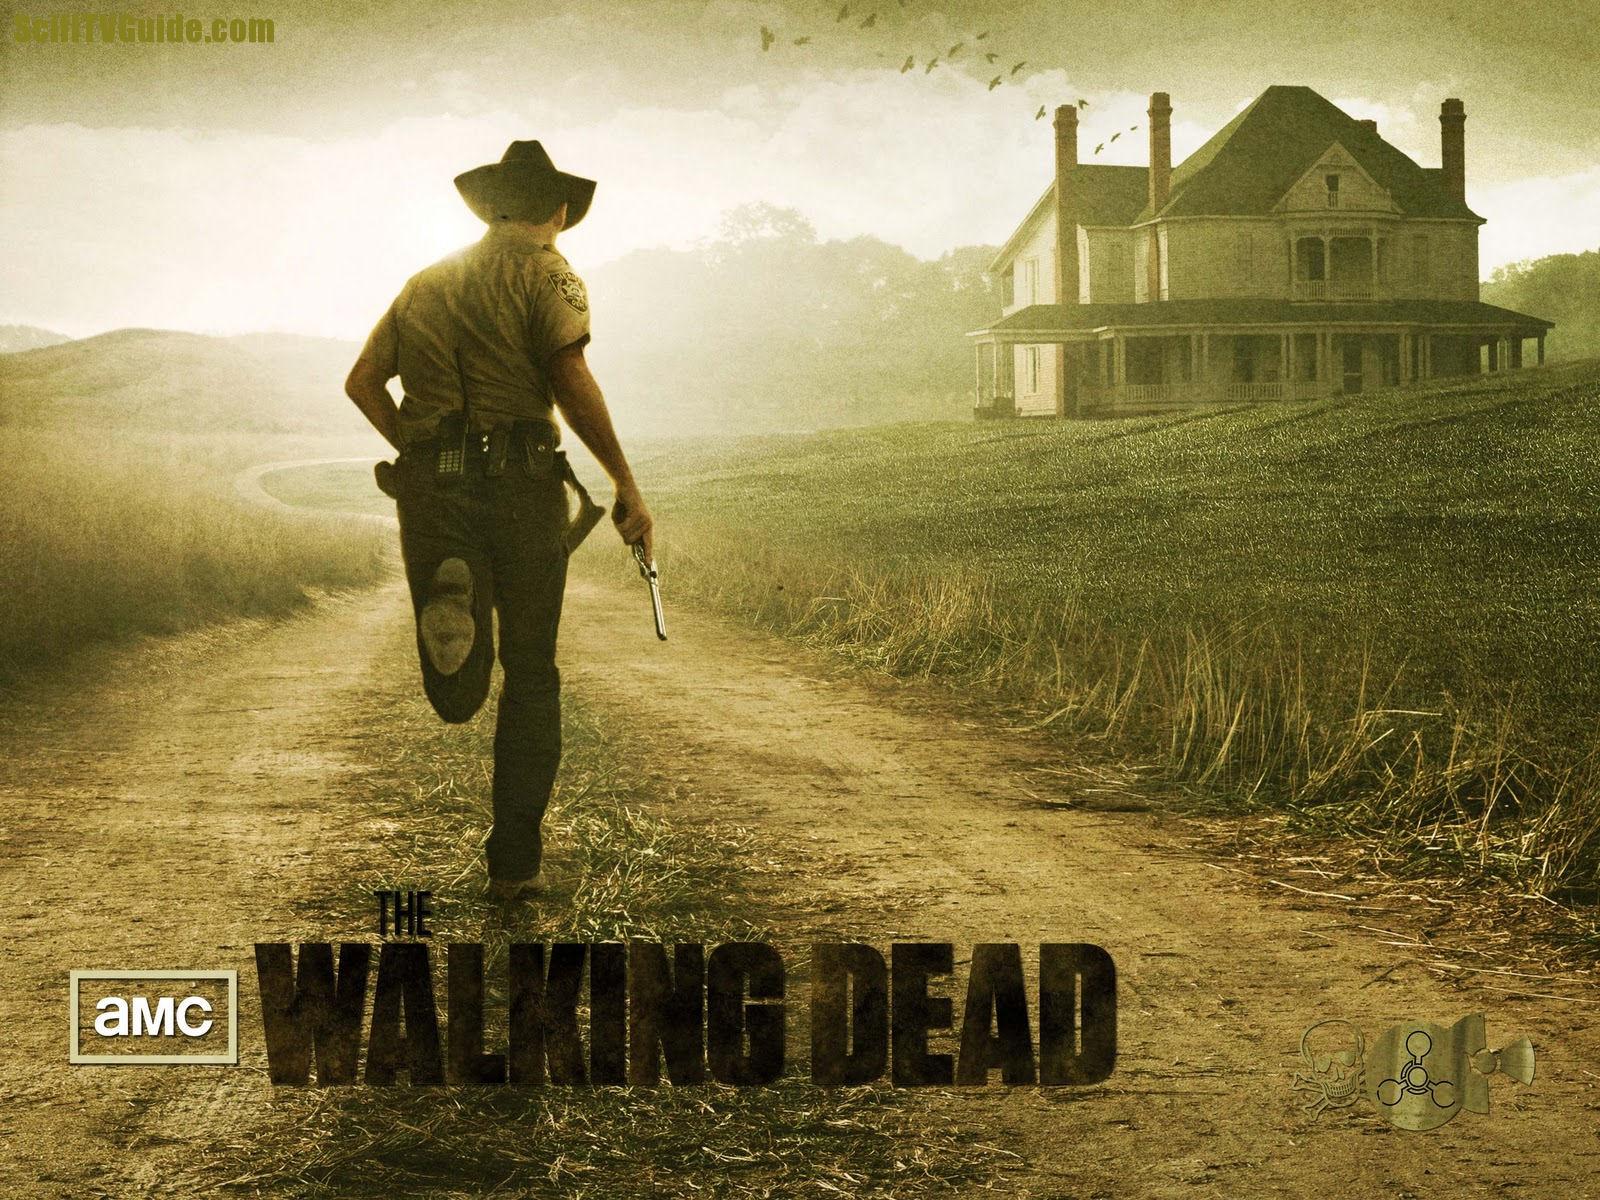 the walking dead s03e12 1080p backgrounds